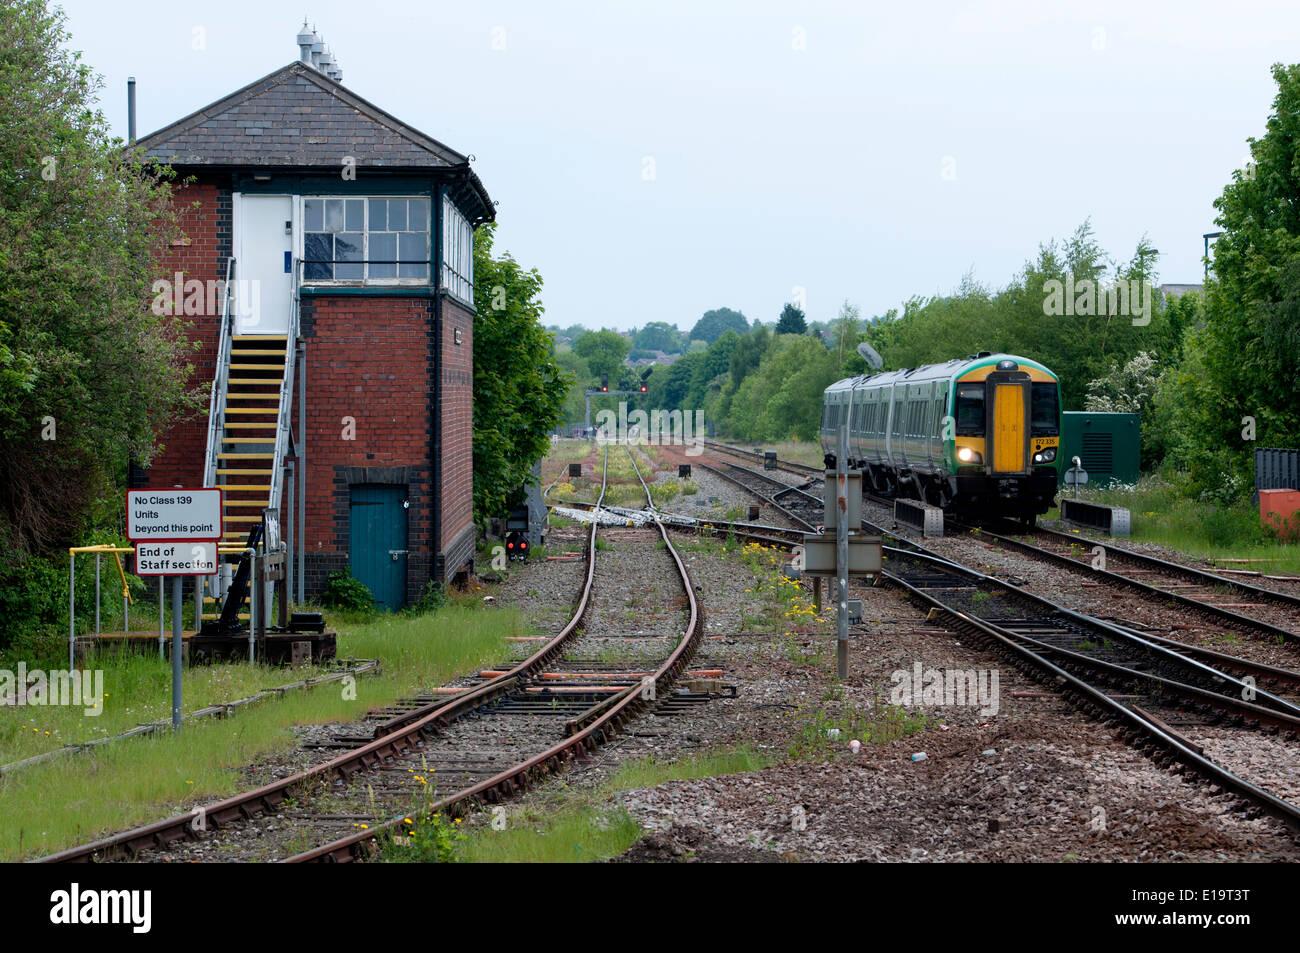 London Midland class 172 diesel multiple unit train at Stourbridge Junction, West Midlands, England, UK - Stock Image